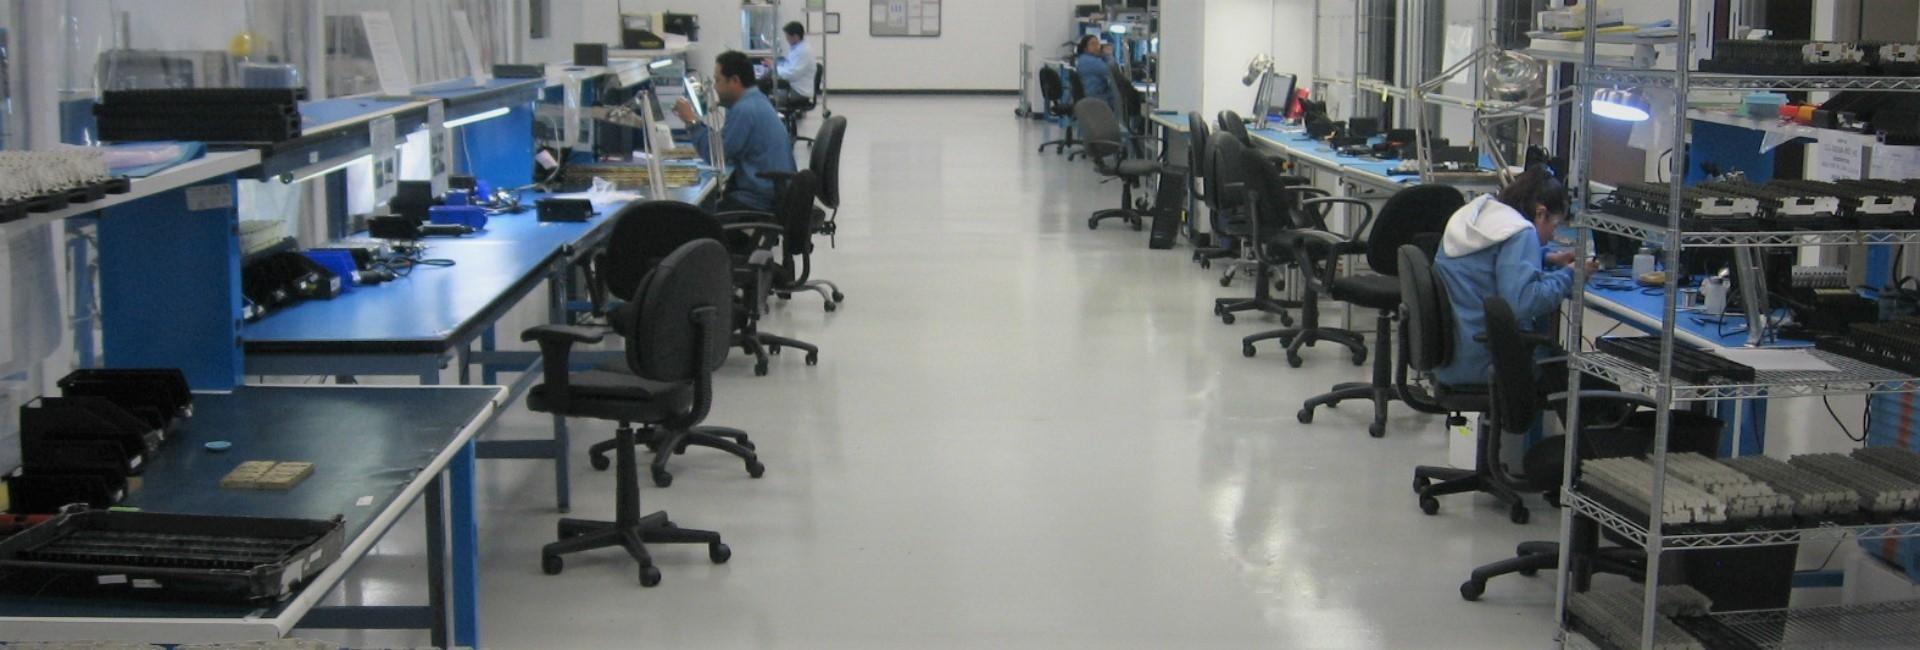 ESD Flooring Epoxy Flooring E P Floors Corp Turnkey Installation - Conductive flooring specifications